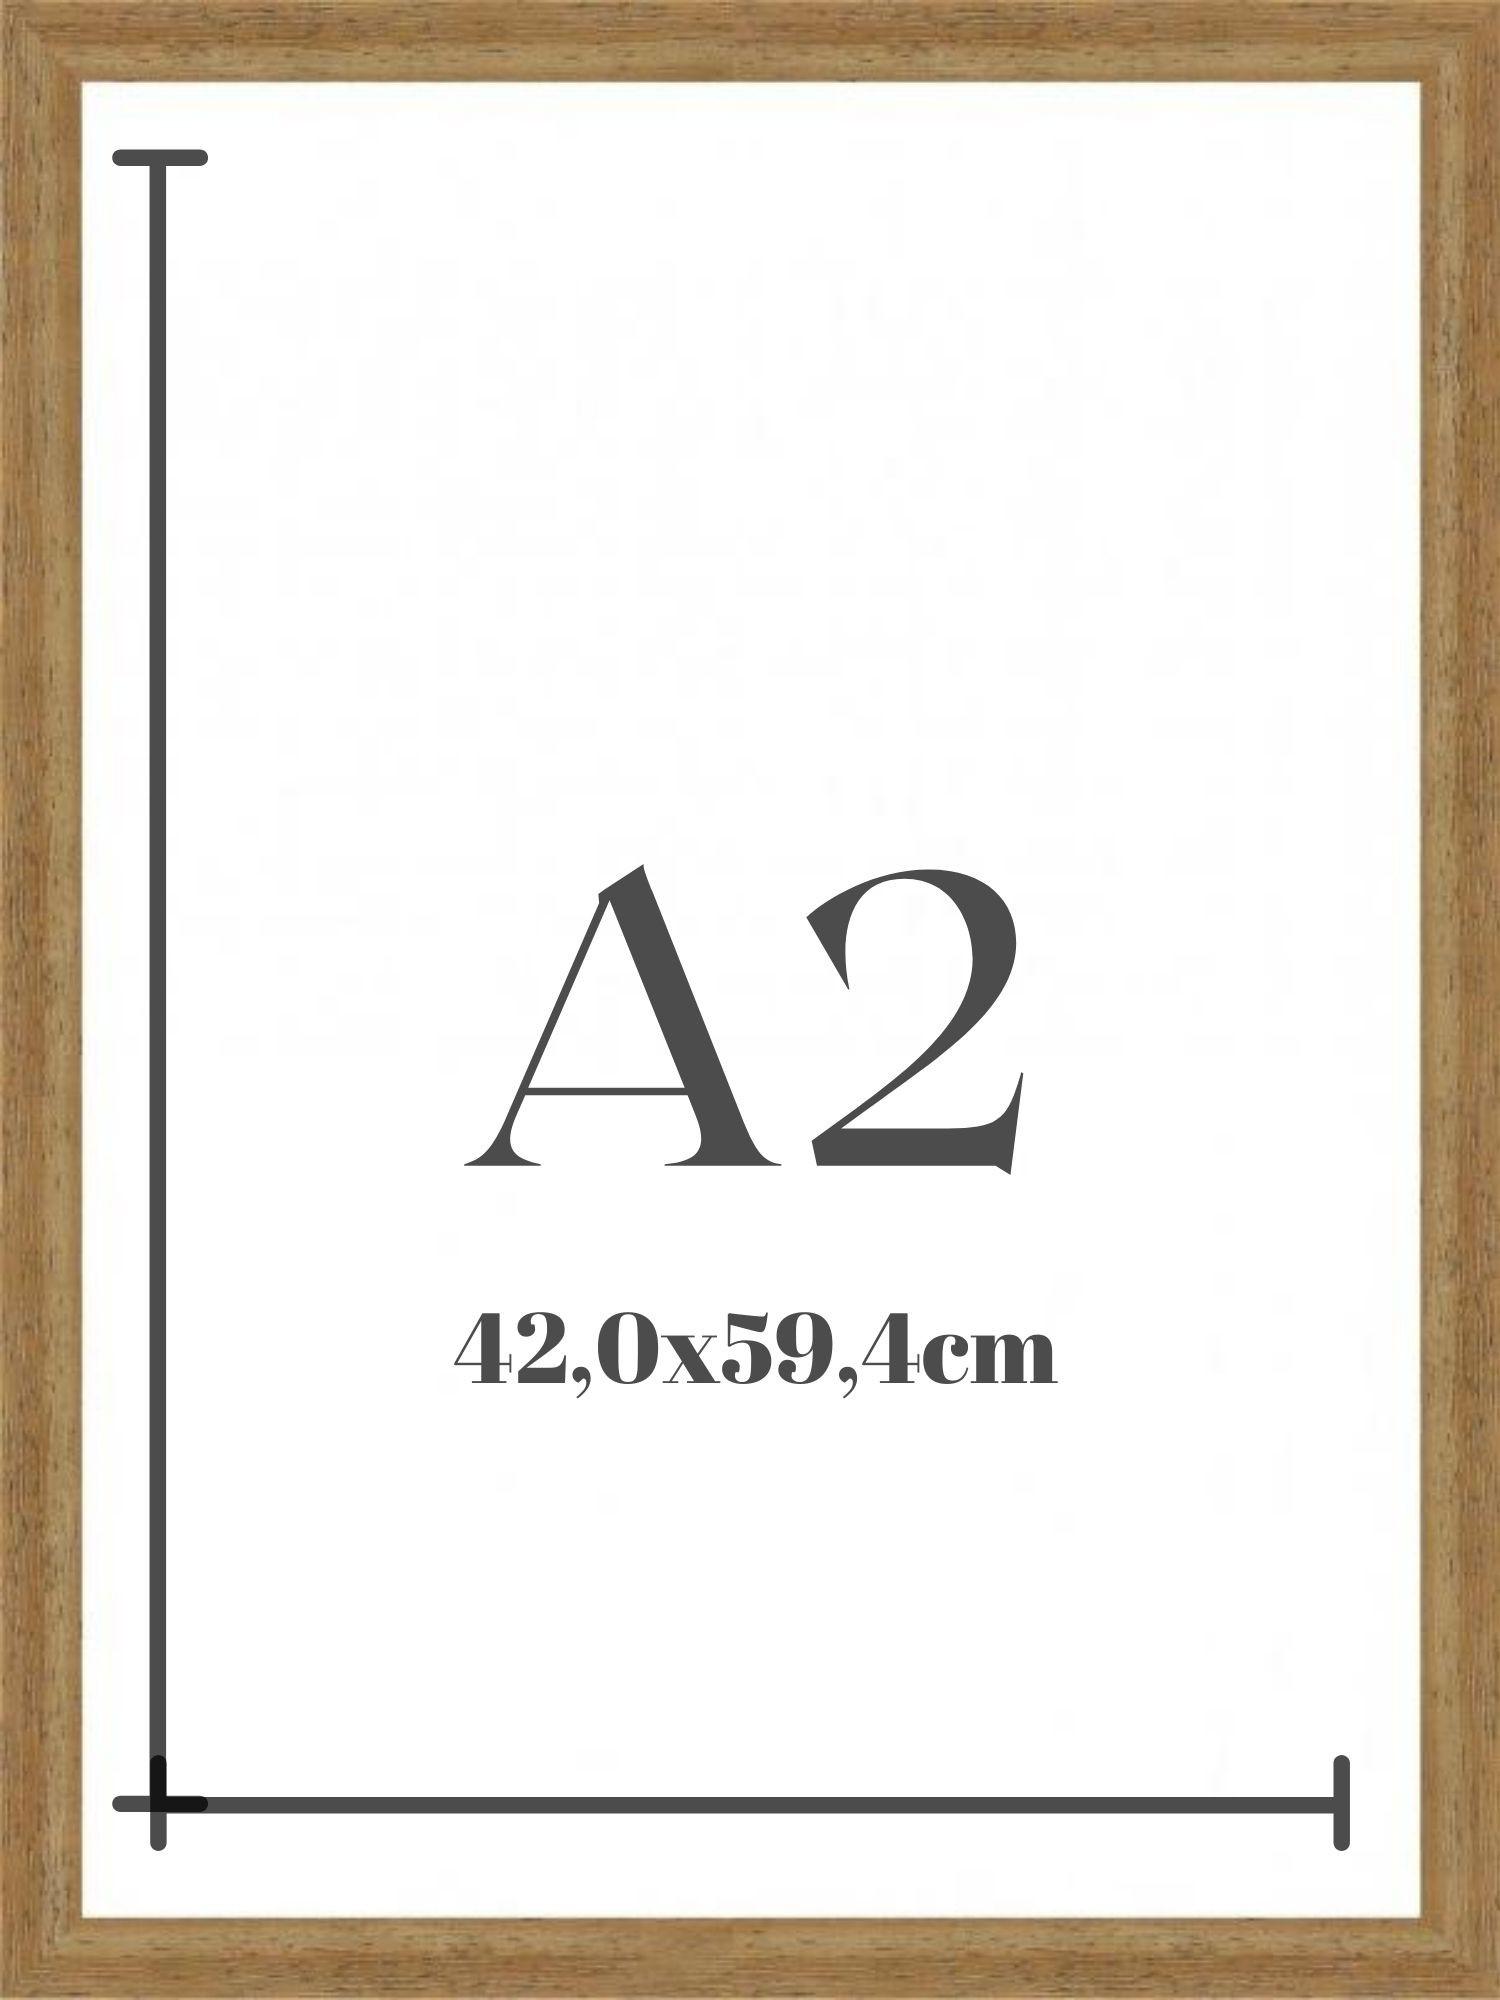 Moldura A2